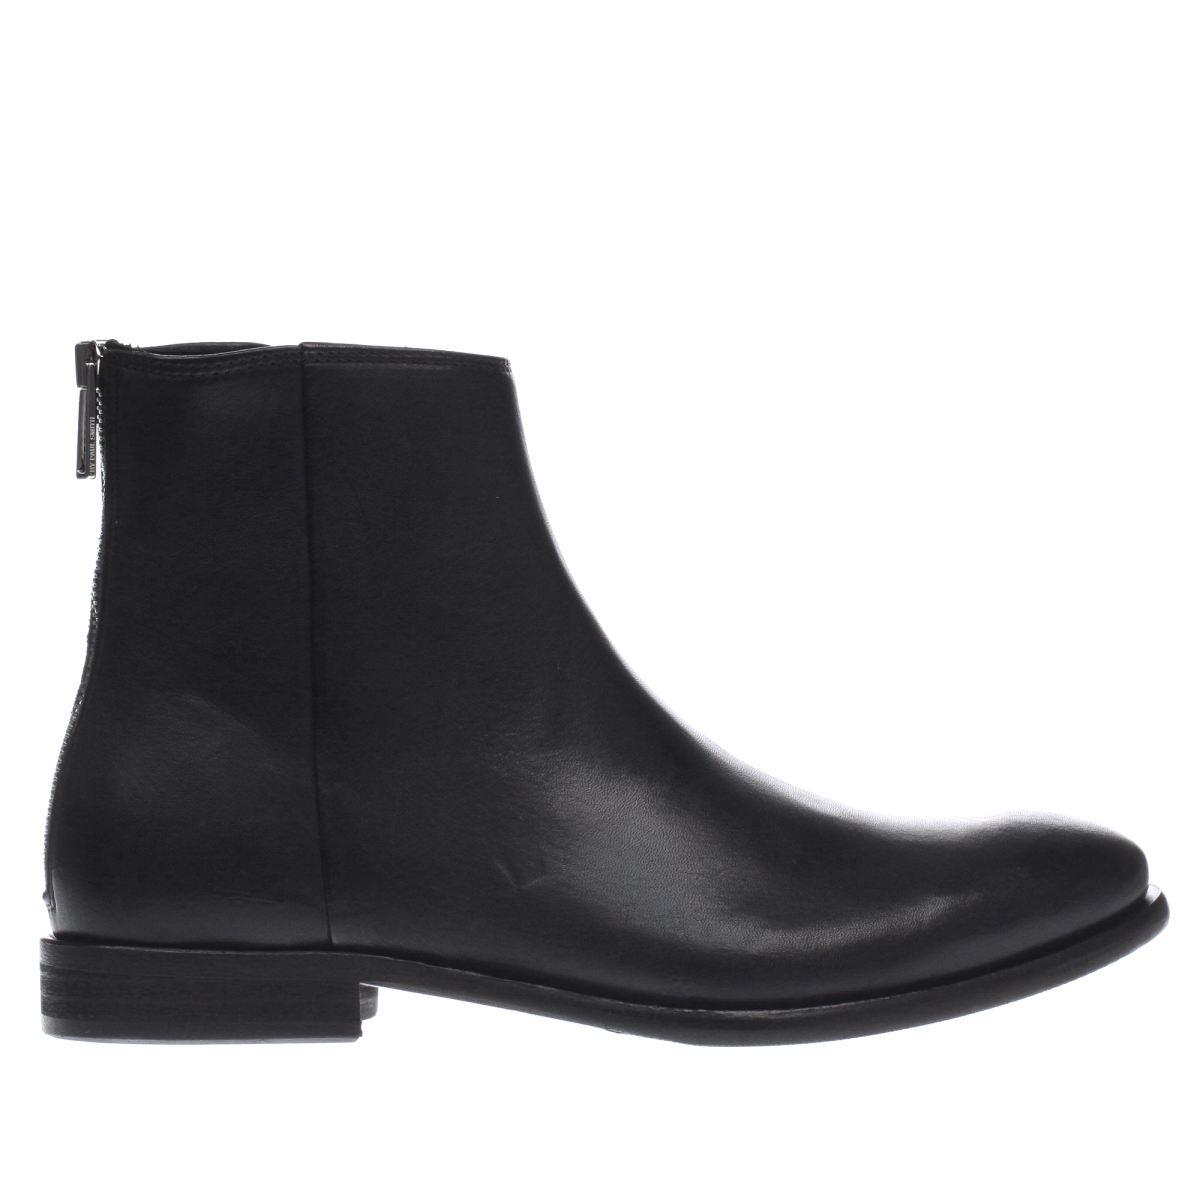 paul smith shoe ps Paul Smith Shoe Ps Black Jean Boots